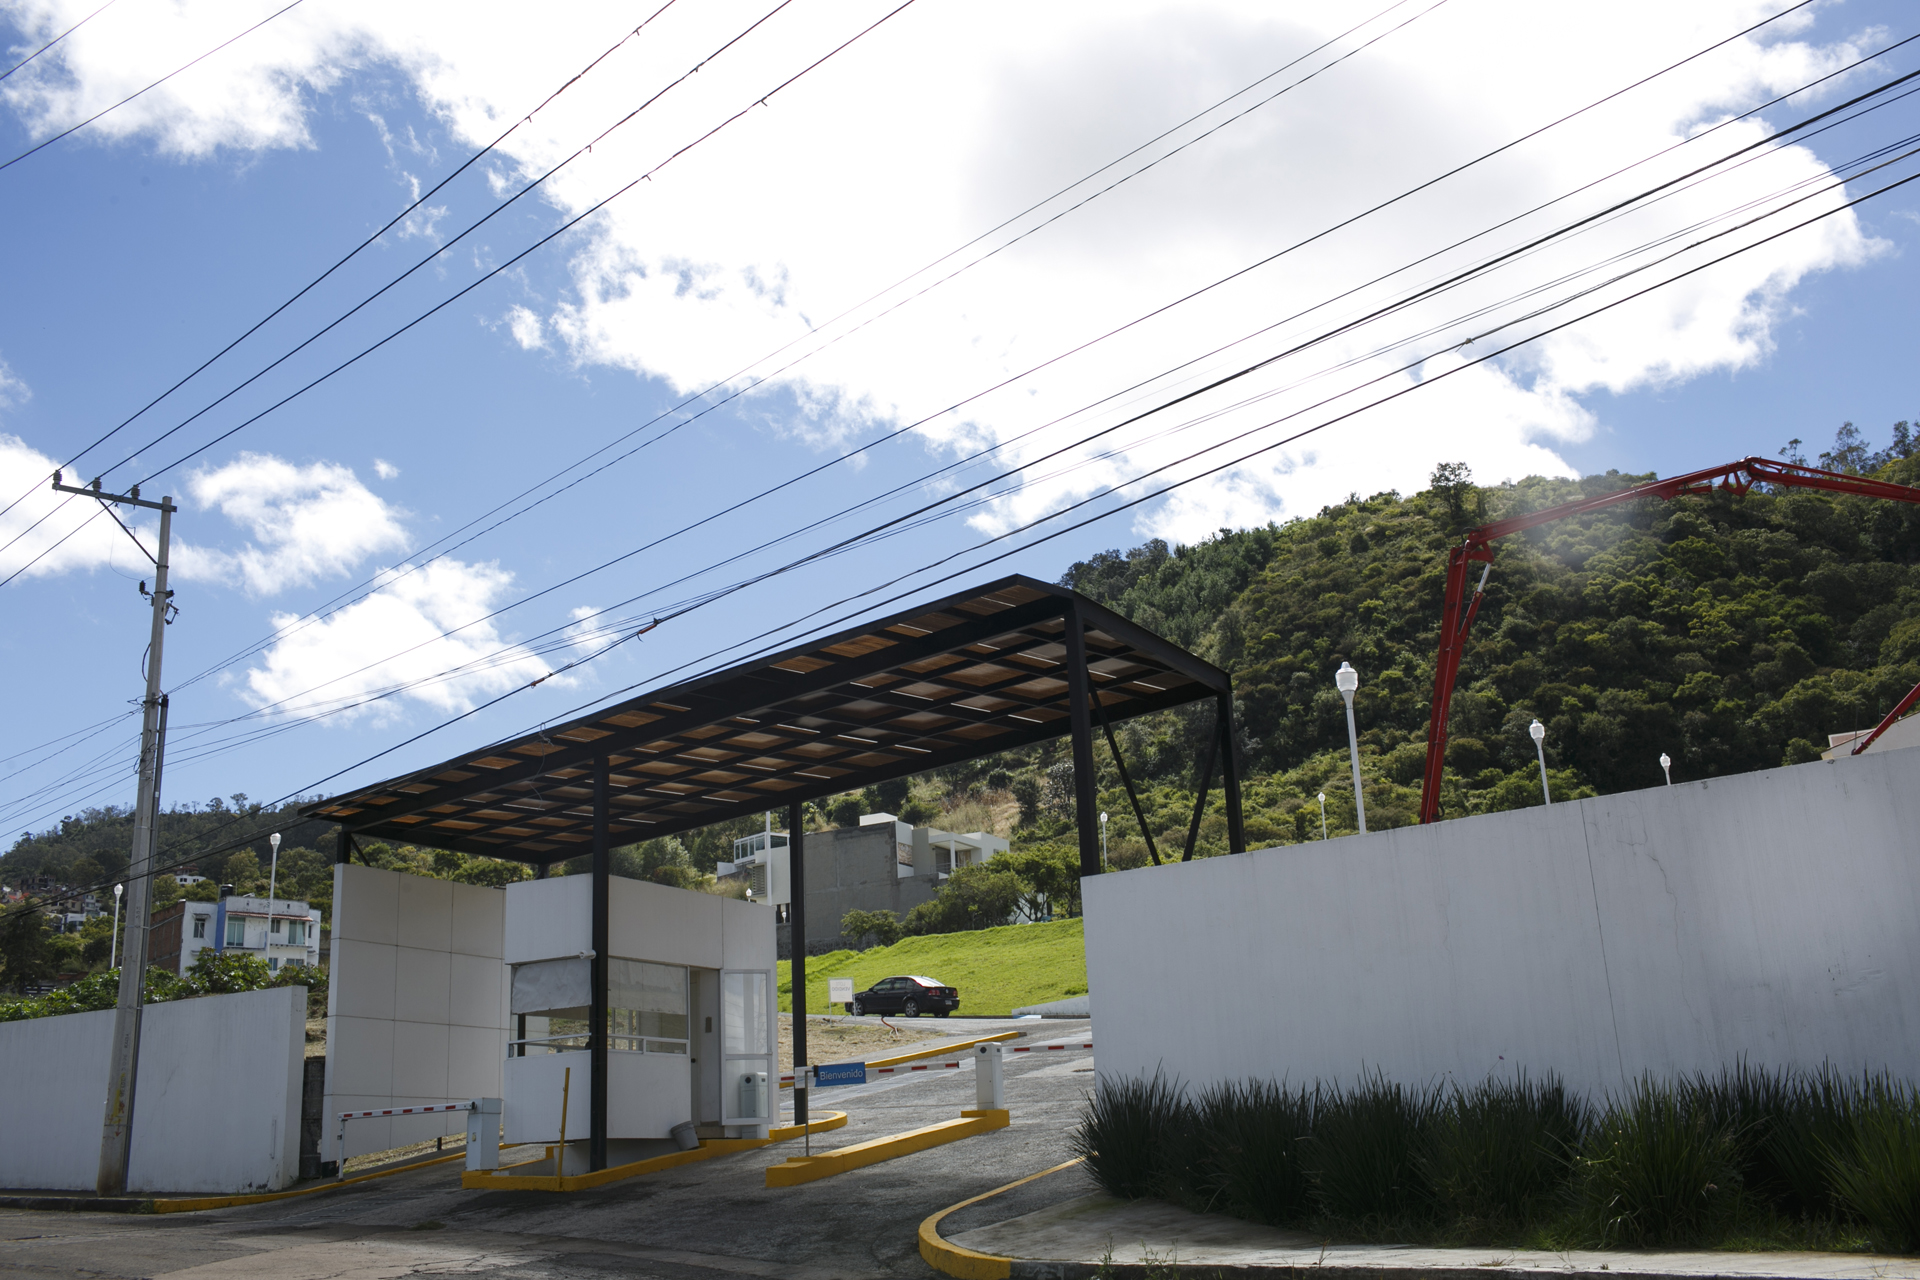 Puntalba 2 ¡Disponible! - Imagen 1